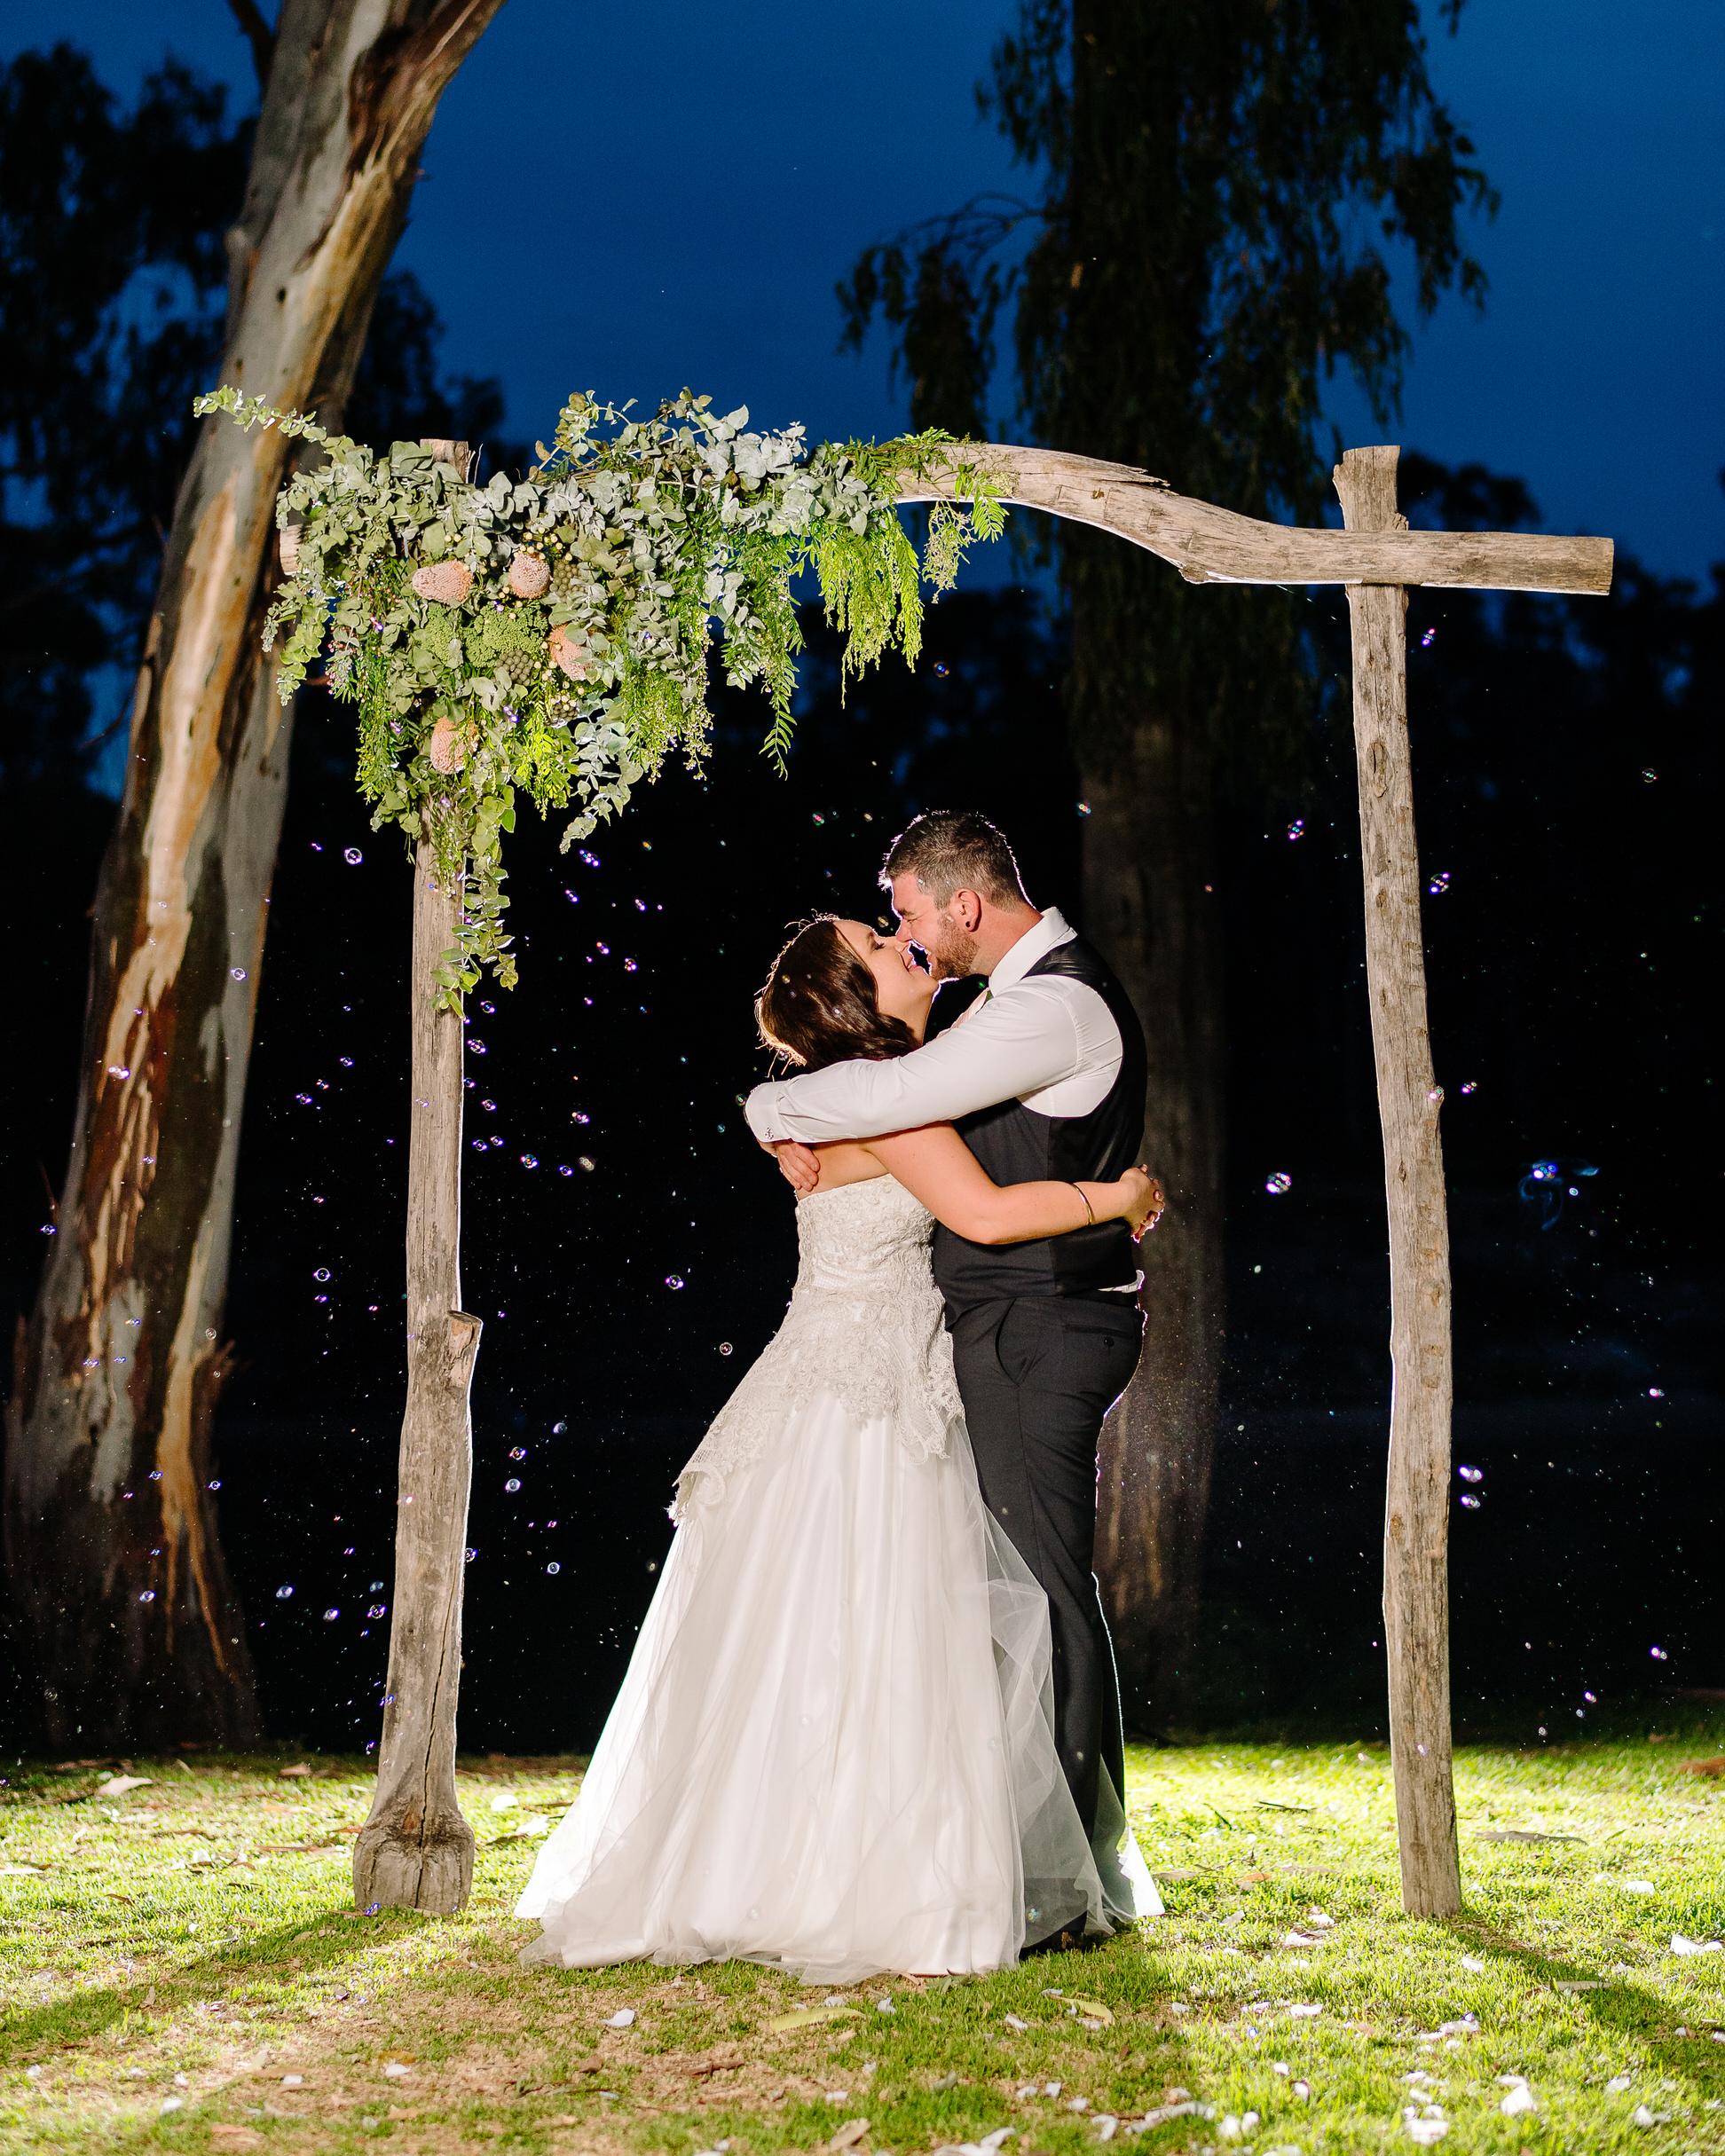 Justin_Jim_Echuca_Wedding_Photography_Tindarra-297.JPG